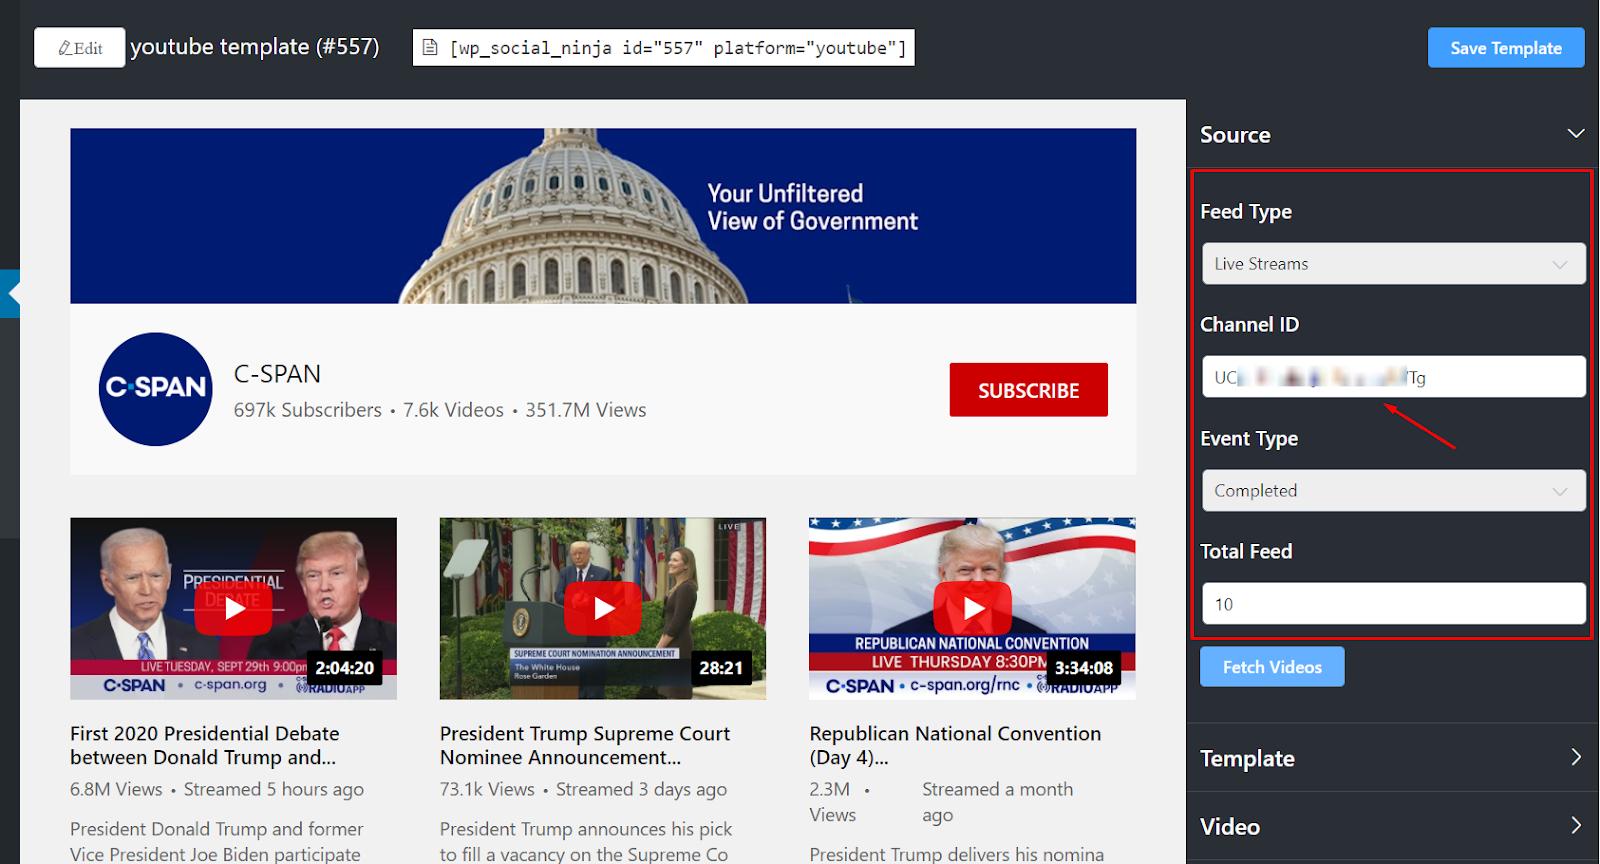 YouTube feed live streams